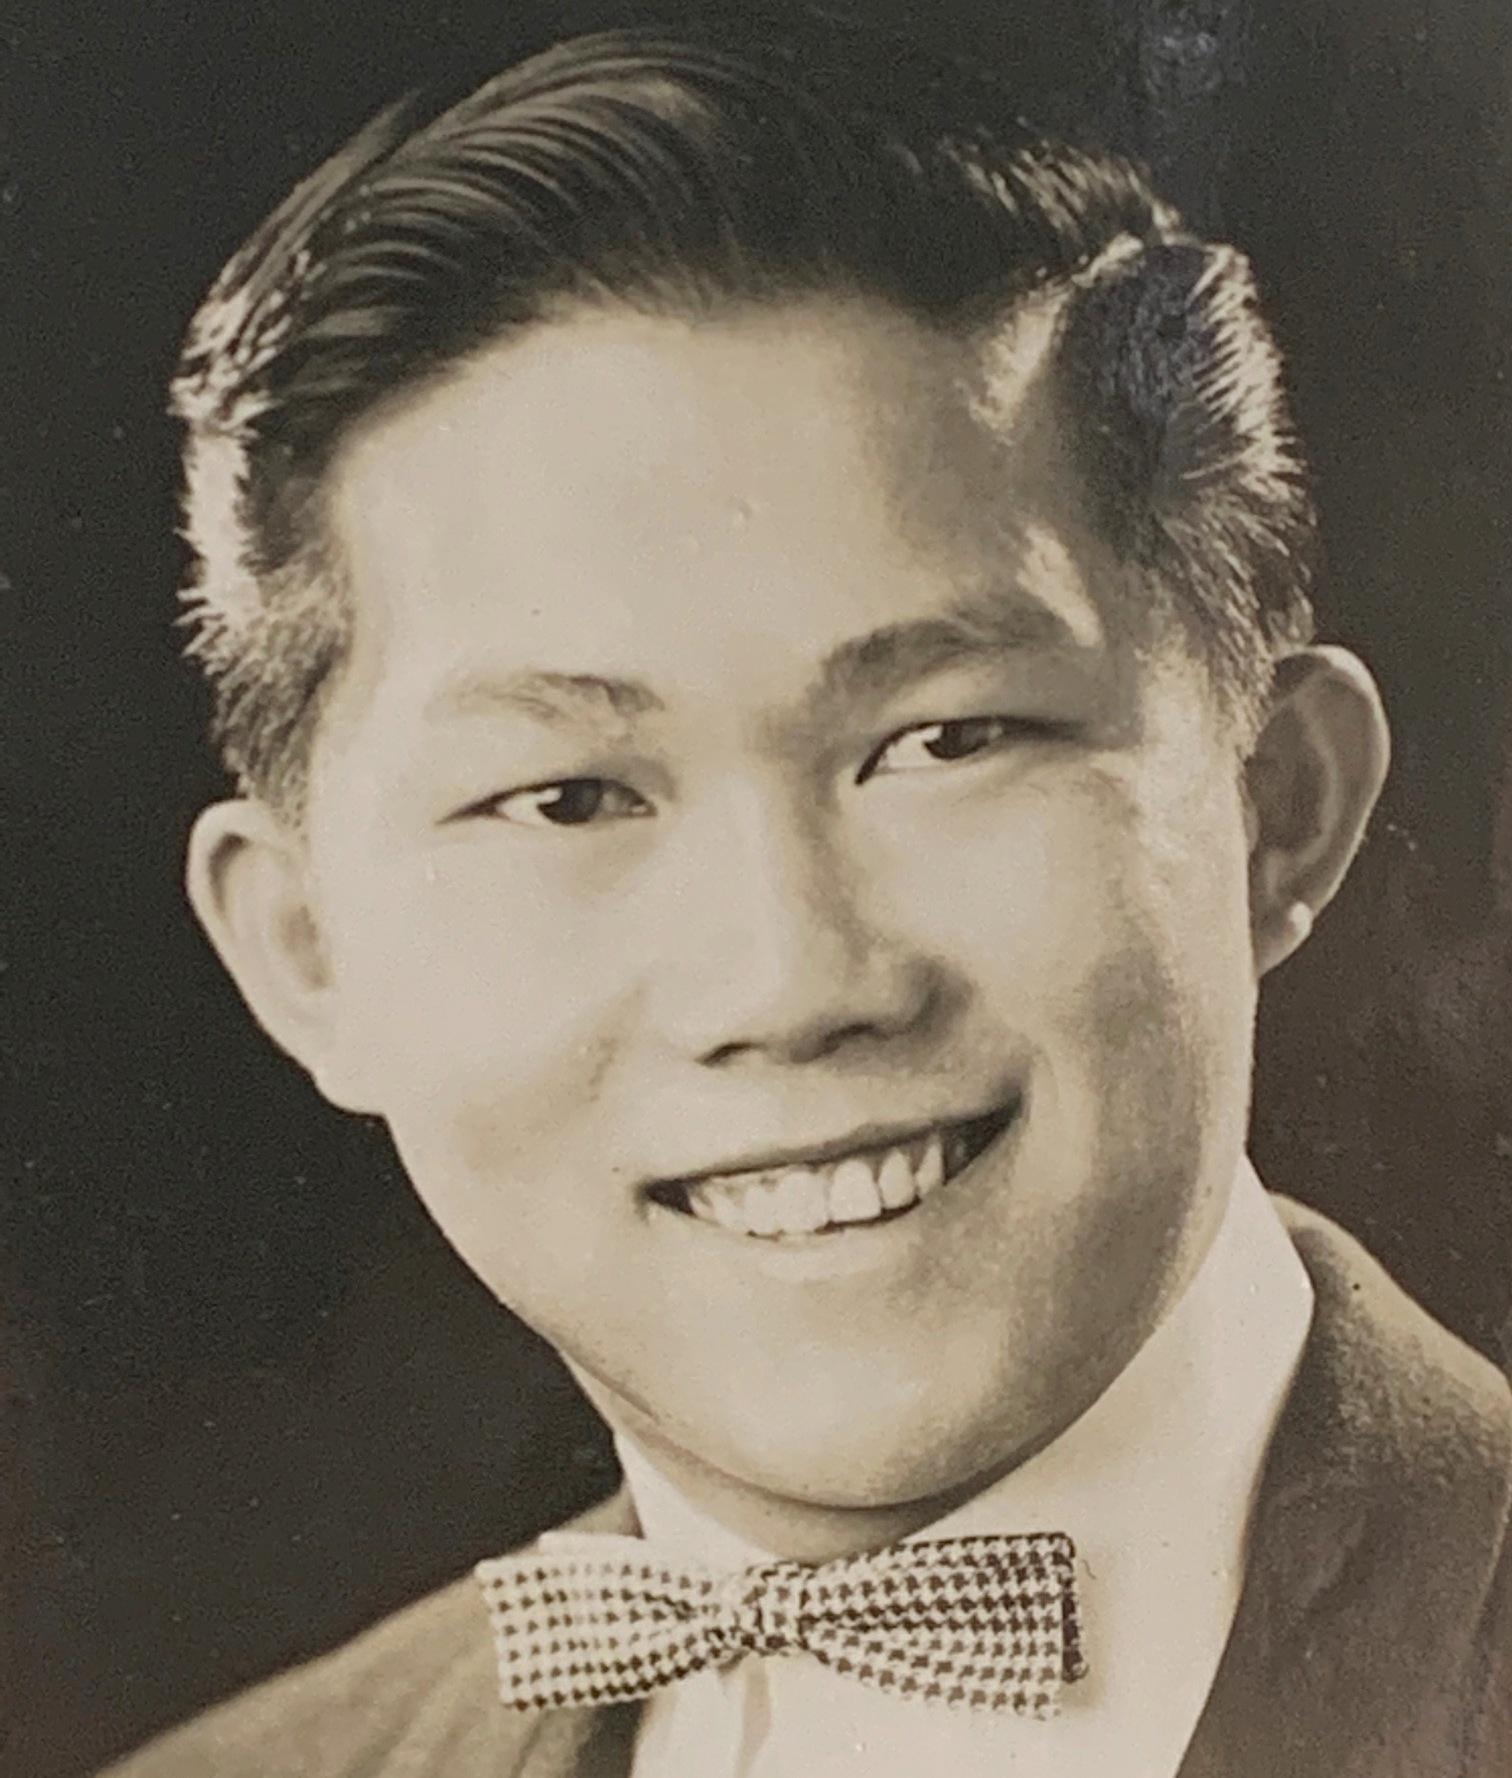 DANIEL KWOCK CHEONG AU